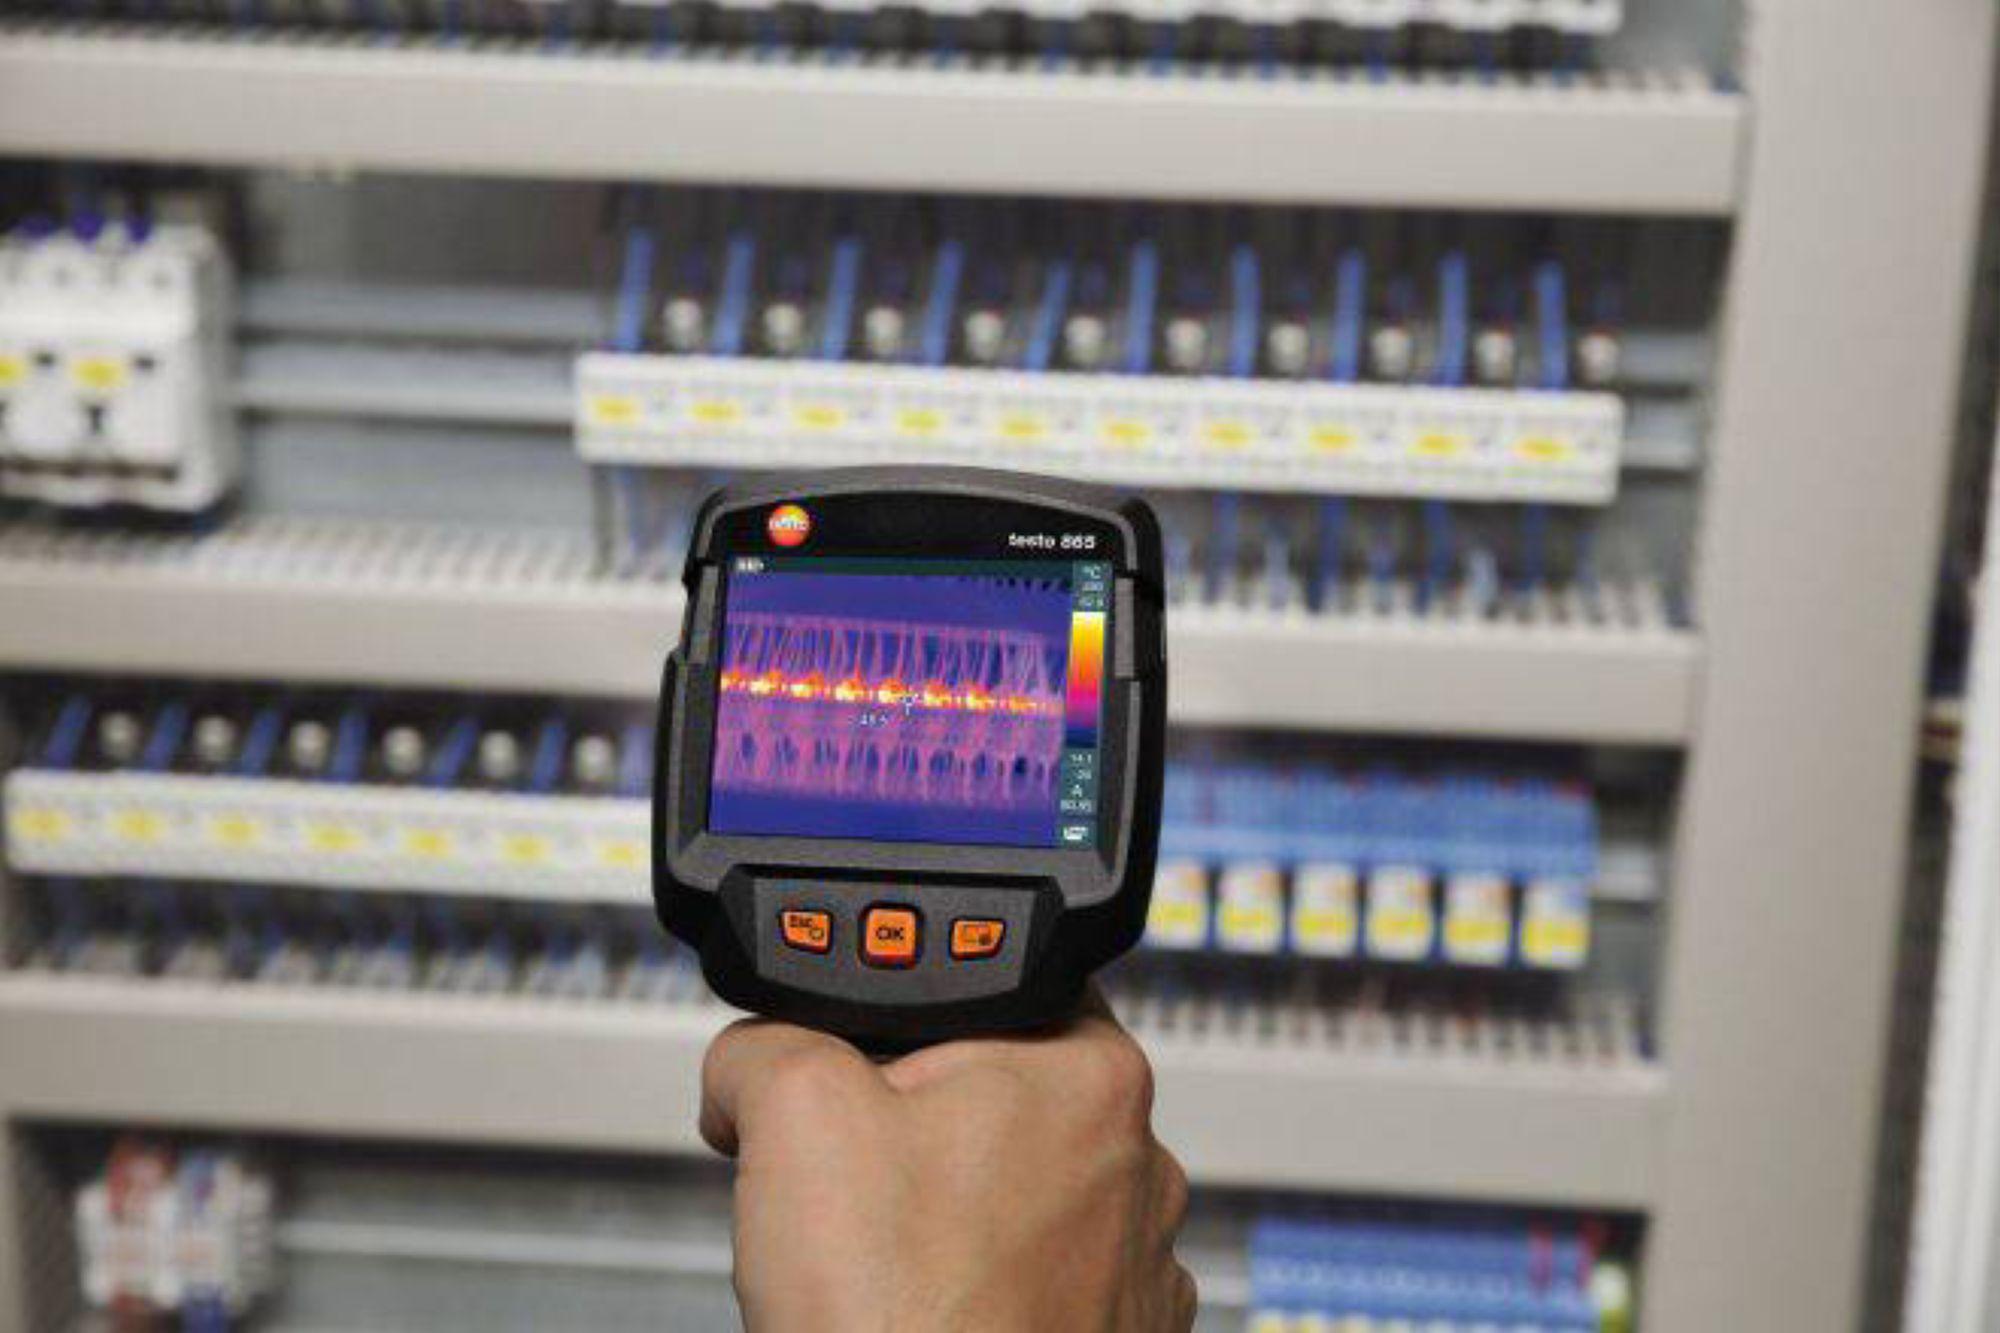 testo-865-application-electrical-cabinet_prl.jpg